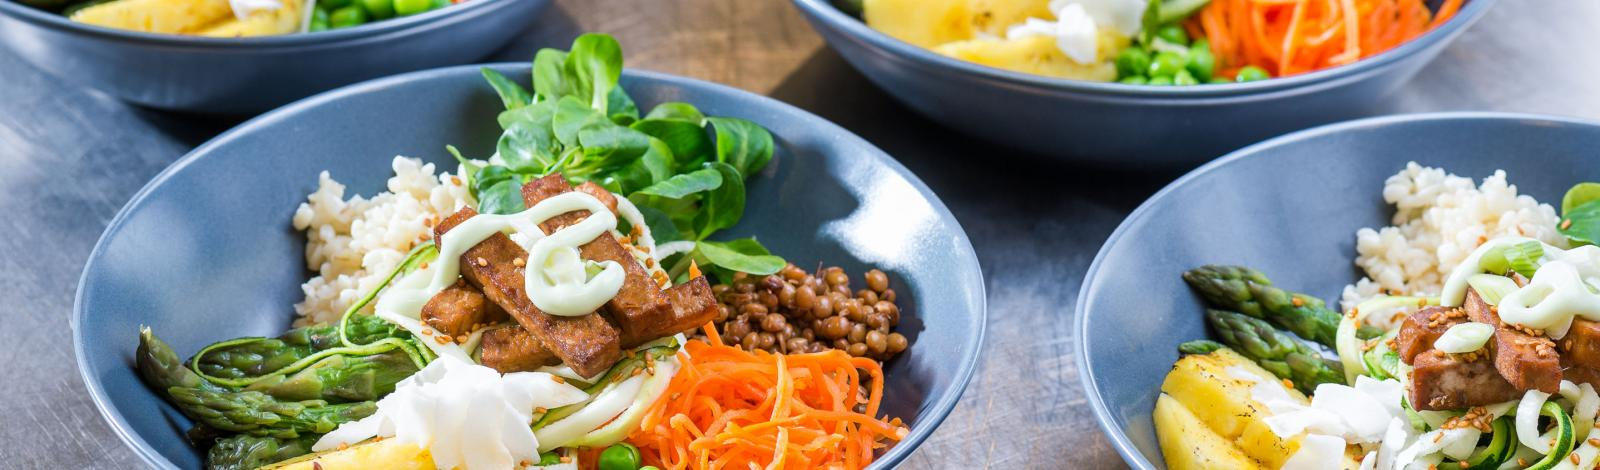 Buddha Bowl: Nutritious delicious bowl